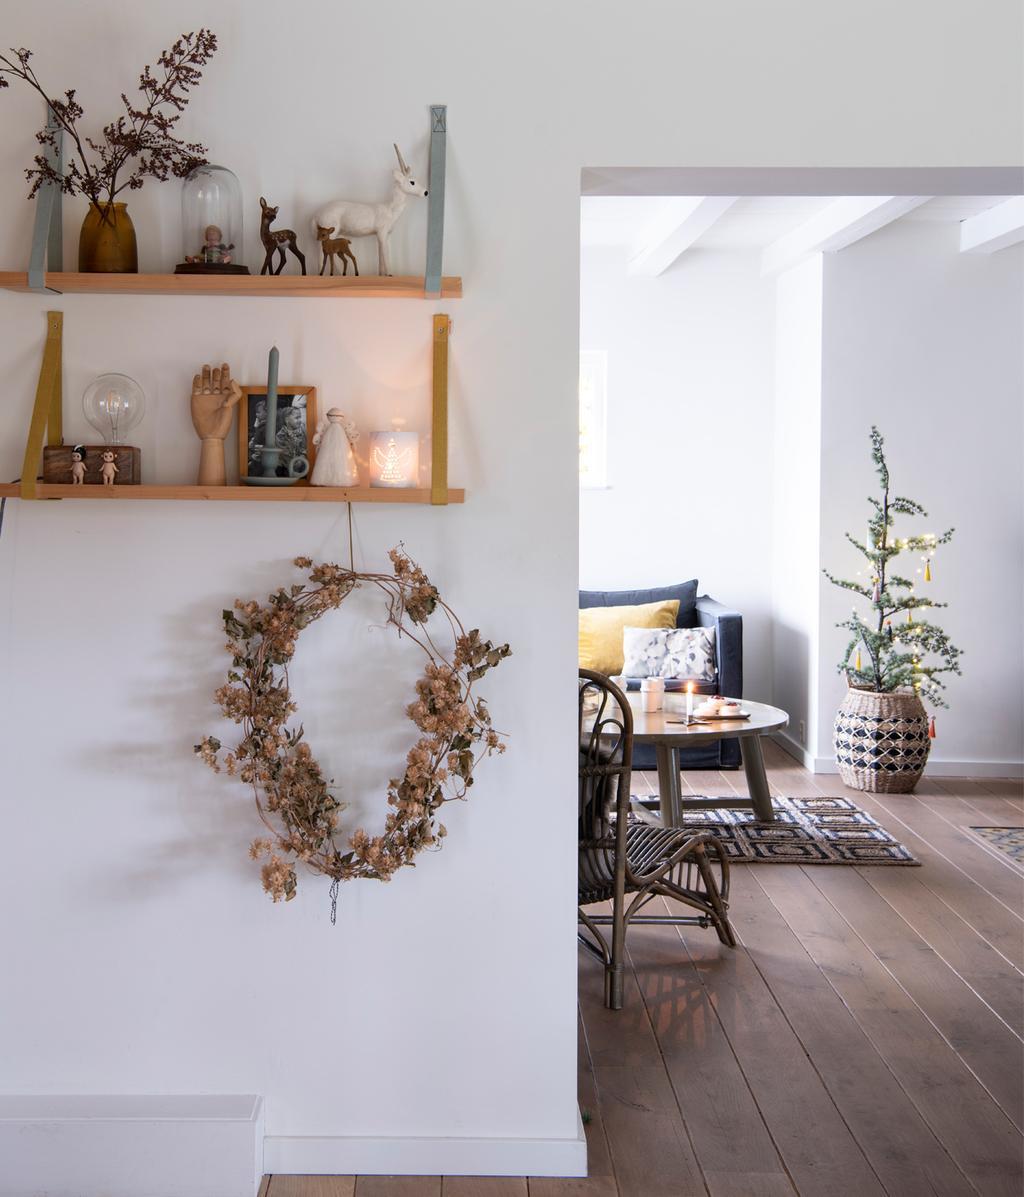 lichte woonkamer | kerstversiering | vtwonen 12-2020